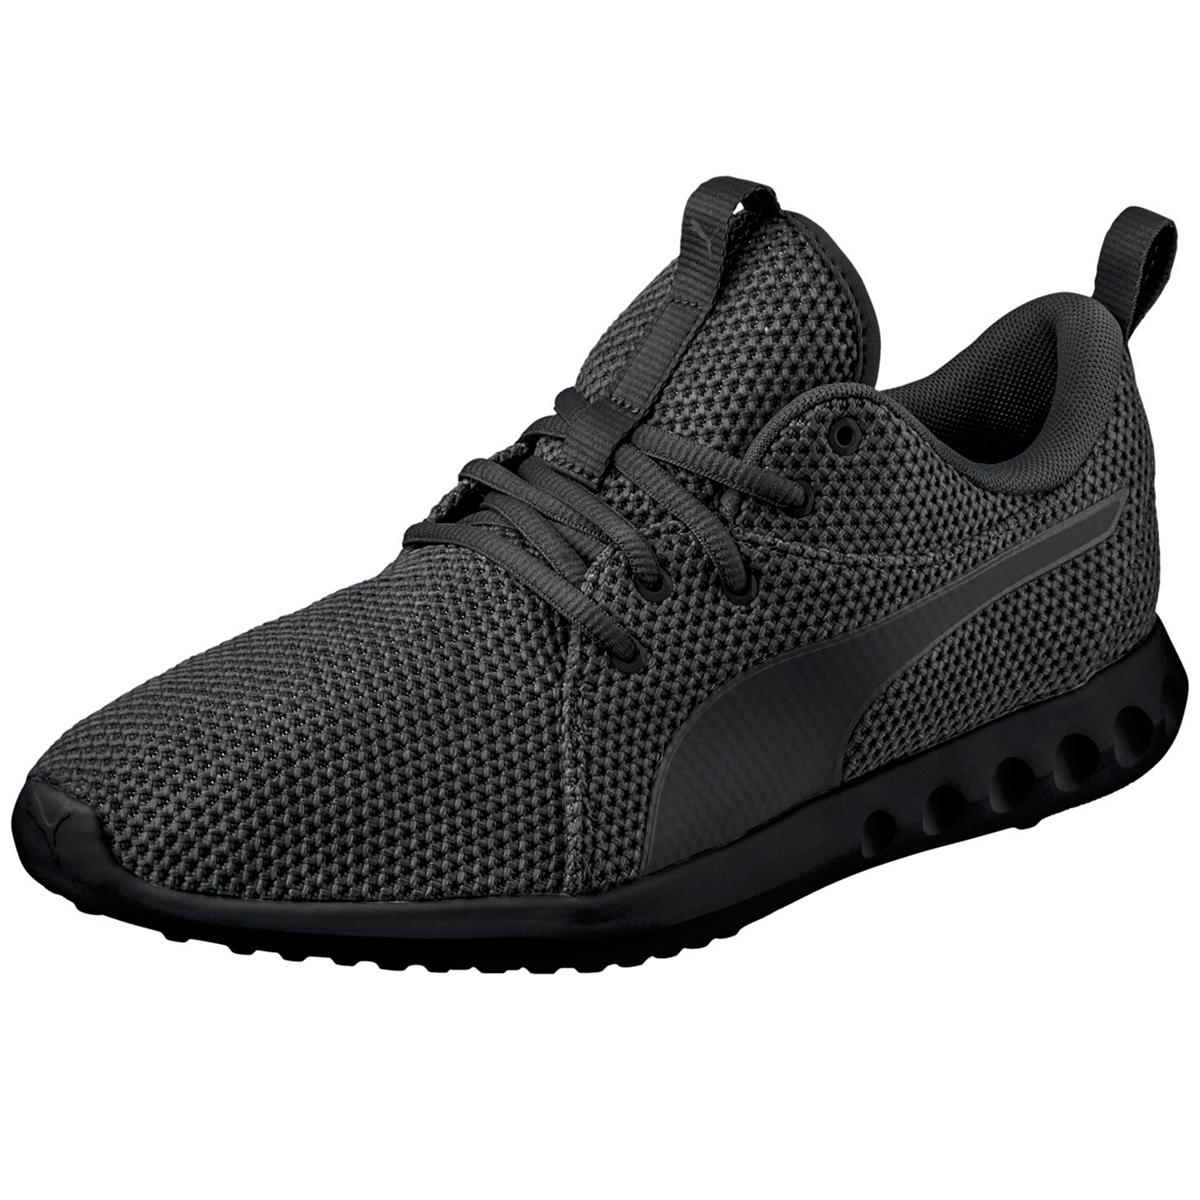 Puma Men's Carson 2 Nature Knit Running Shoes - Black, 9